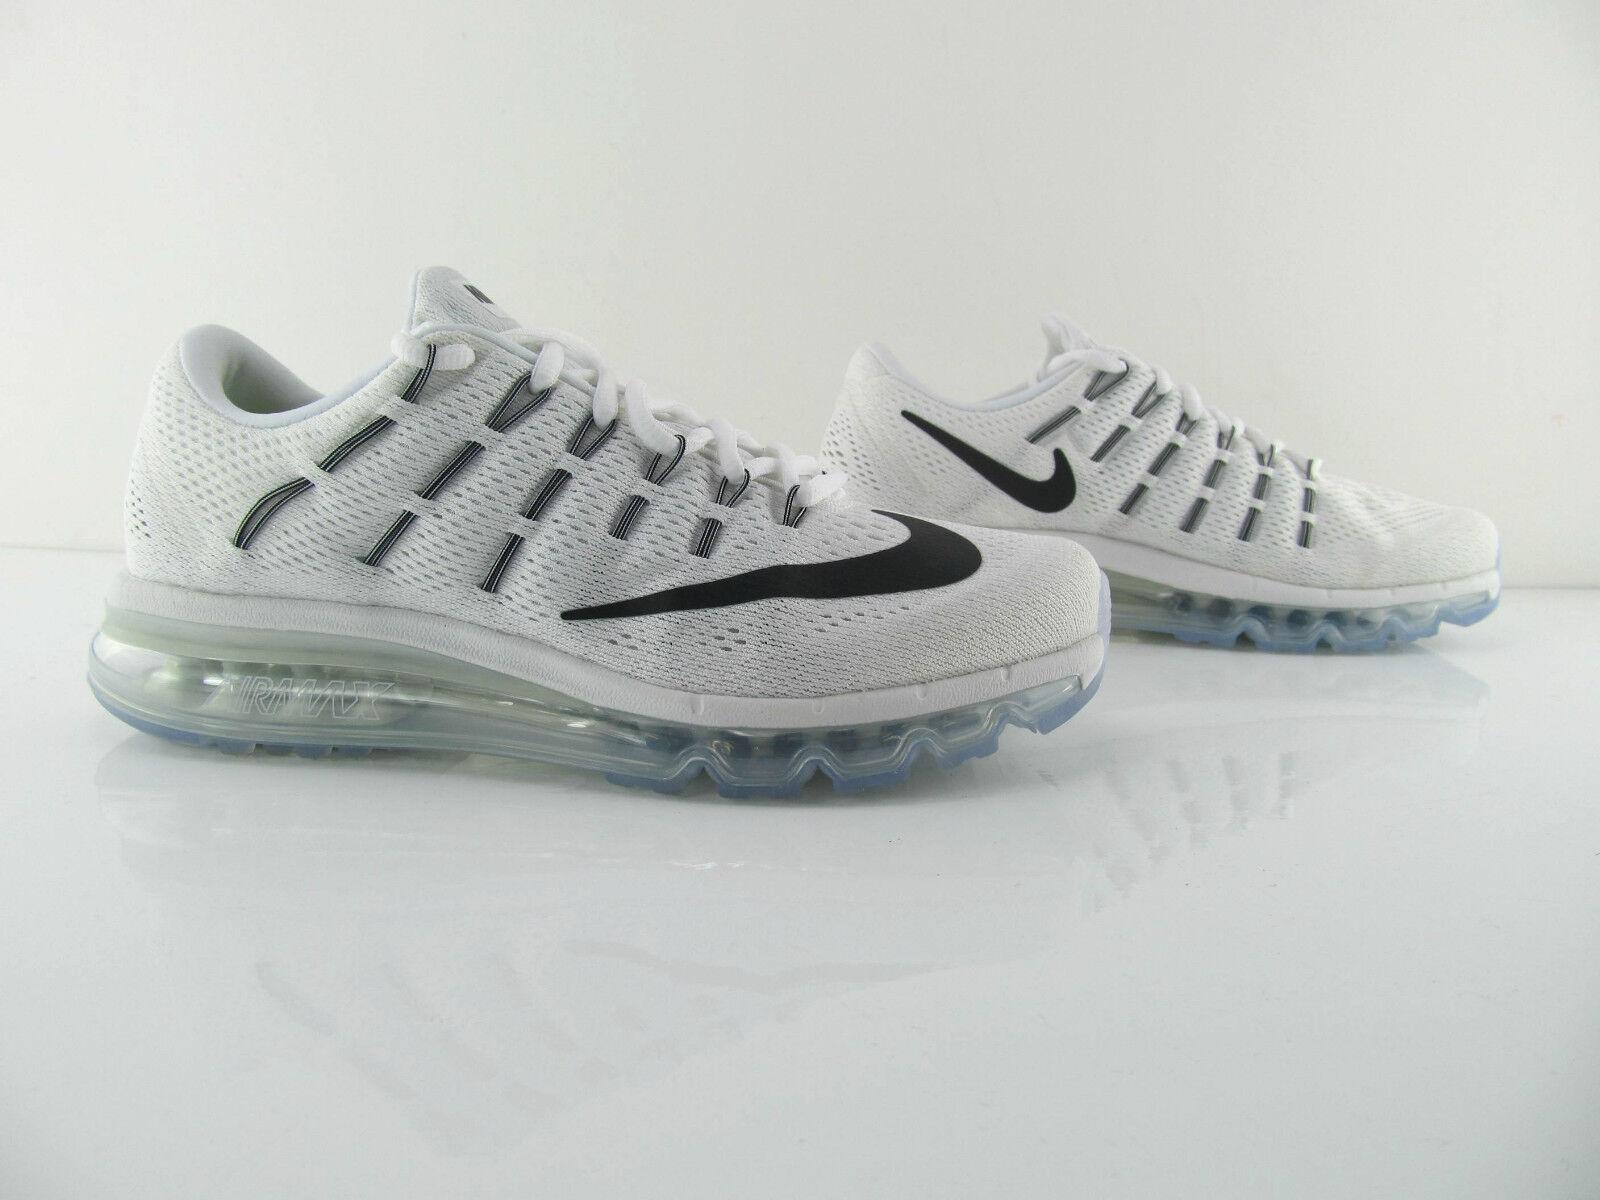 buy popular 0d01c 0c1d7 Nike Air Jordan 4 Retro ...